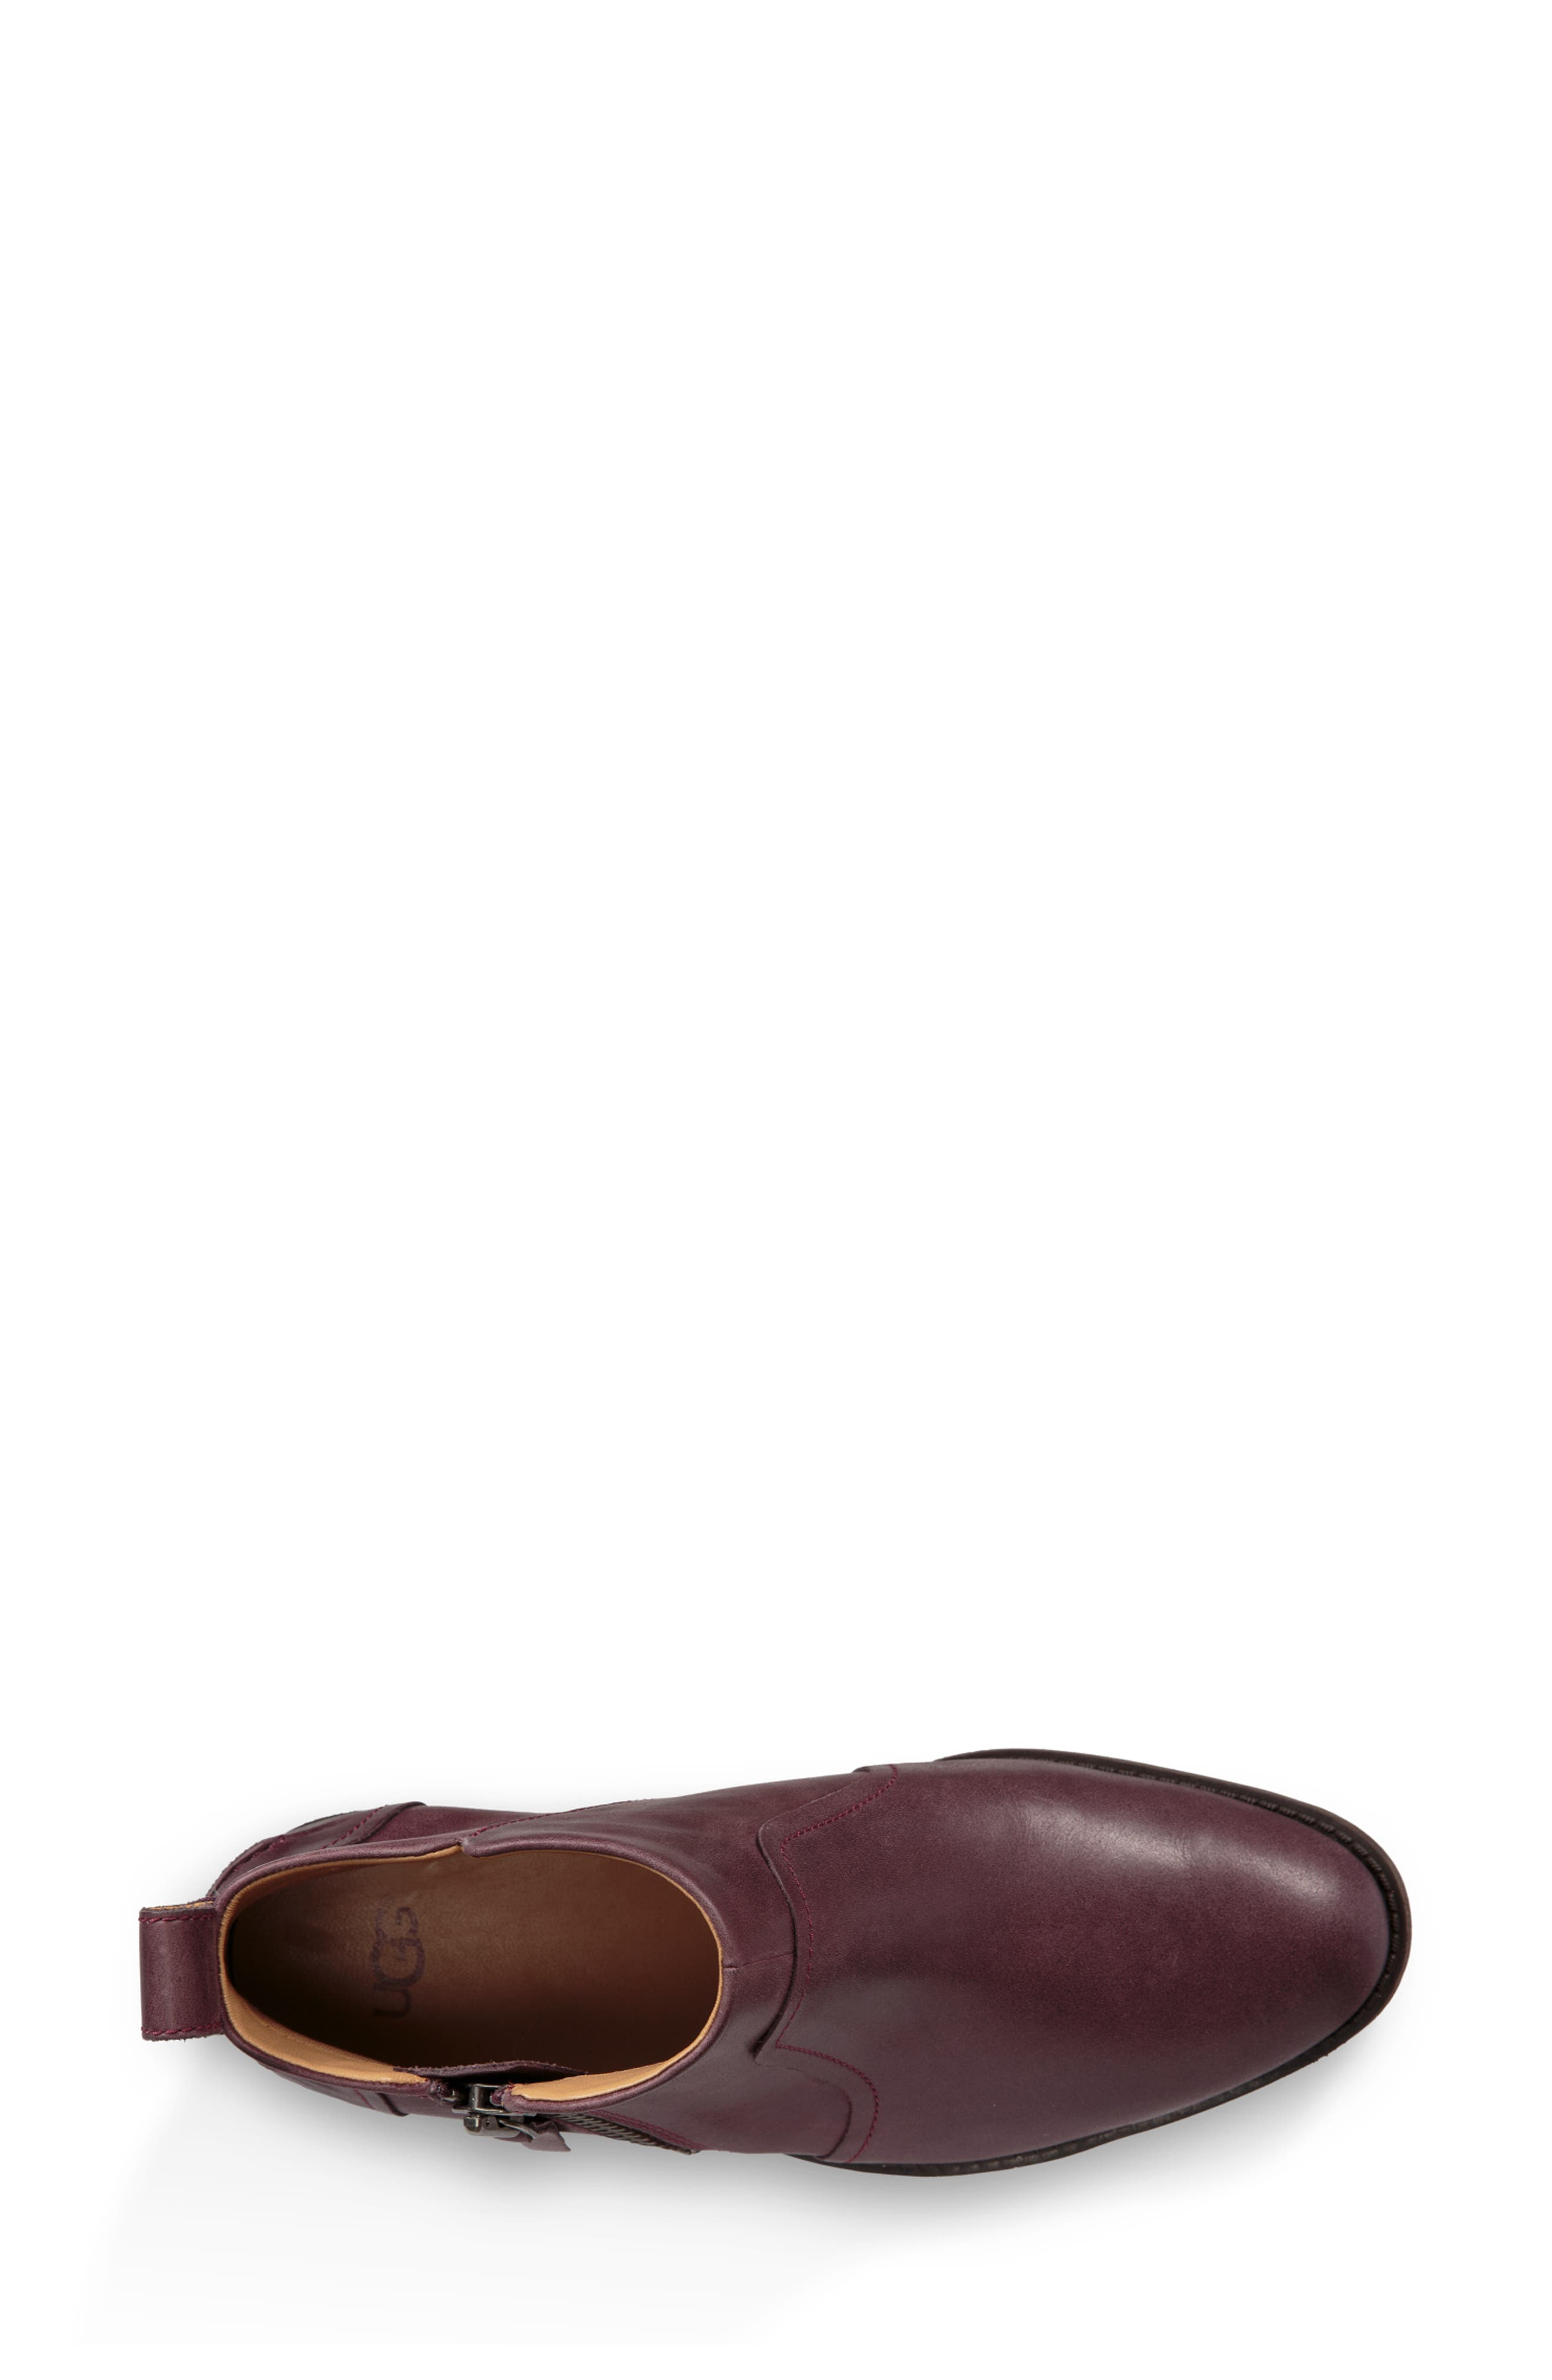 Aureo Bootie,                             Alternate thumbnail 4, color,                             Oxblood Leather